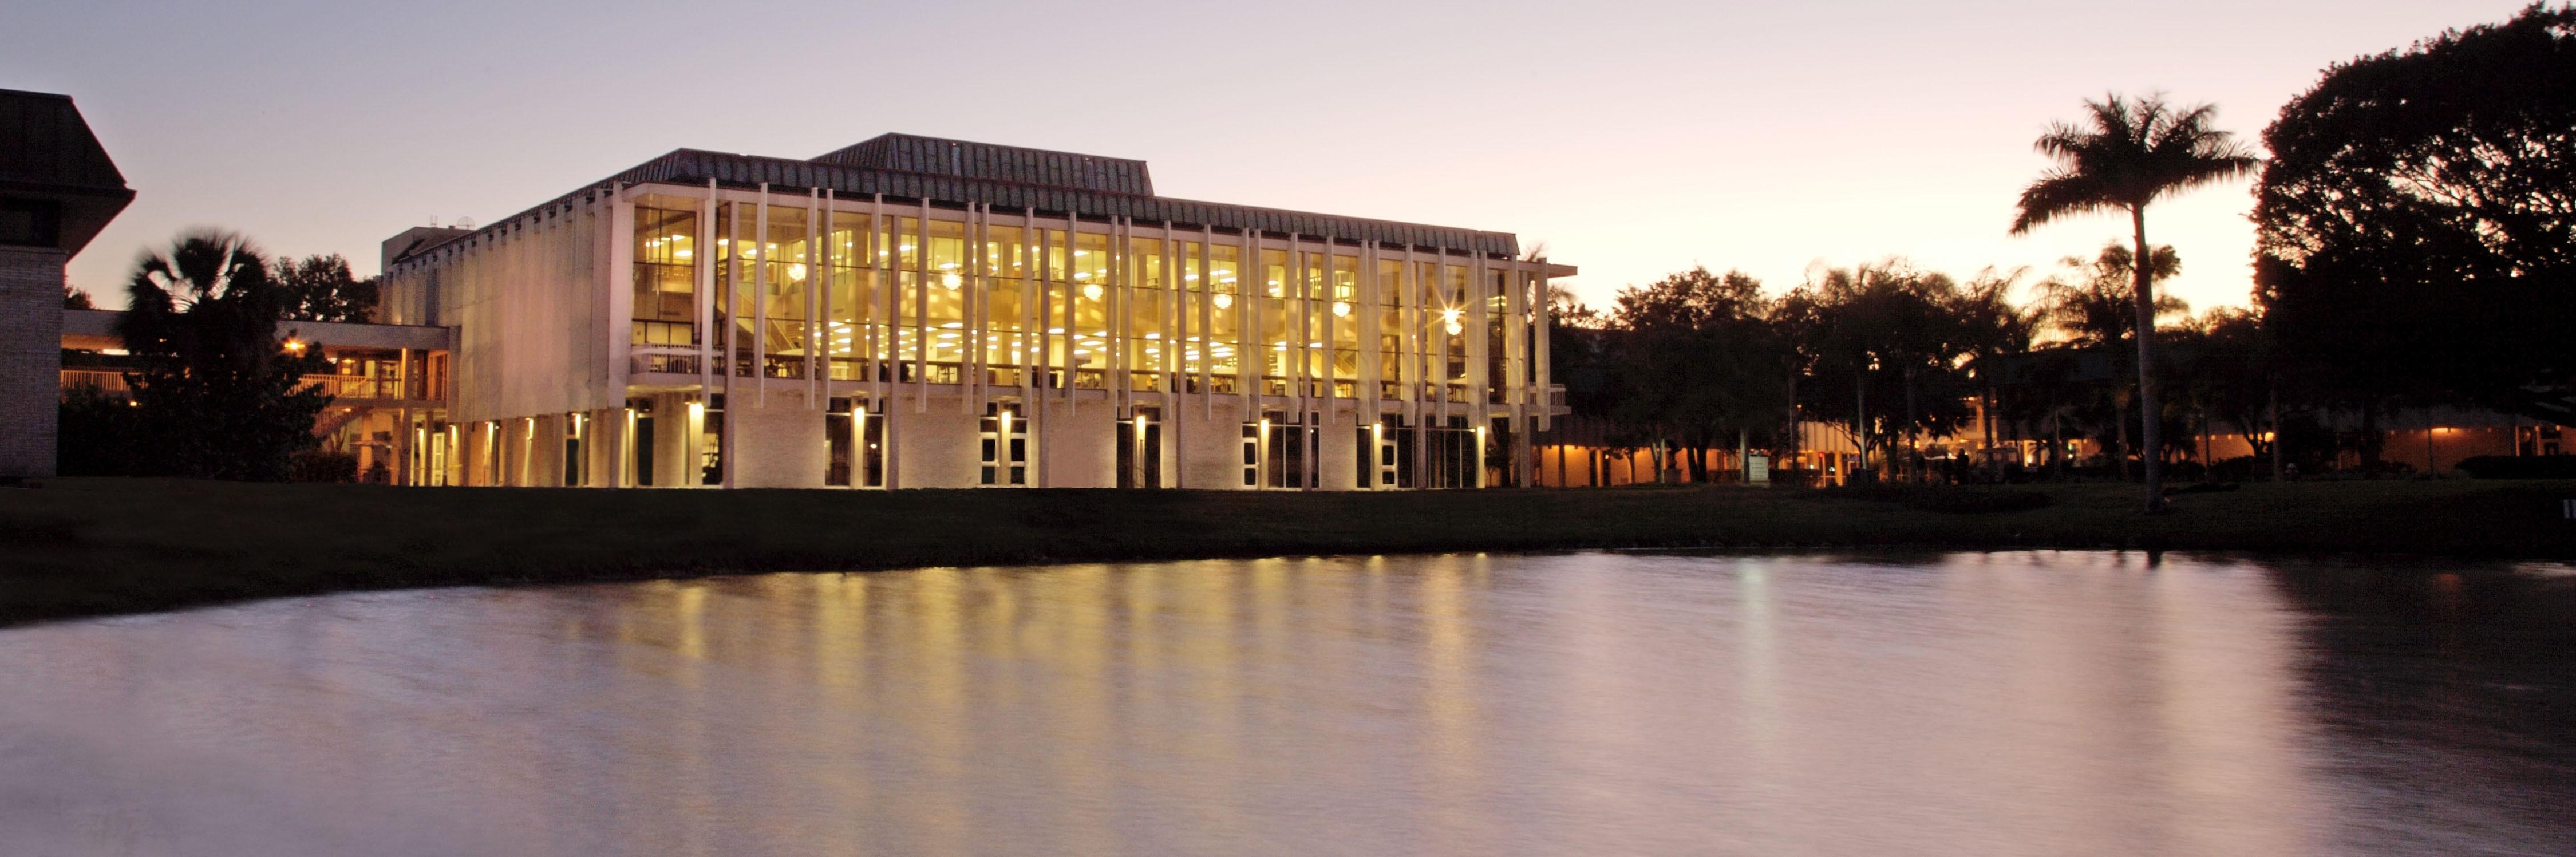 Florida SouthWestern State College   LinkedIn